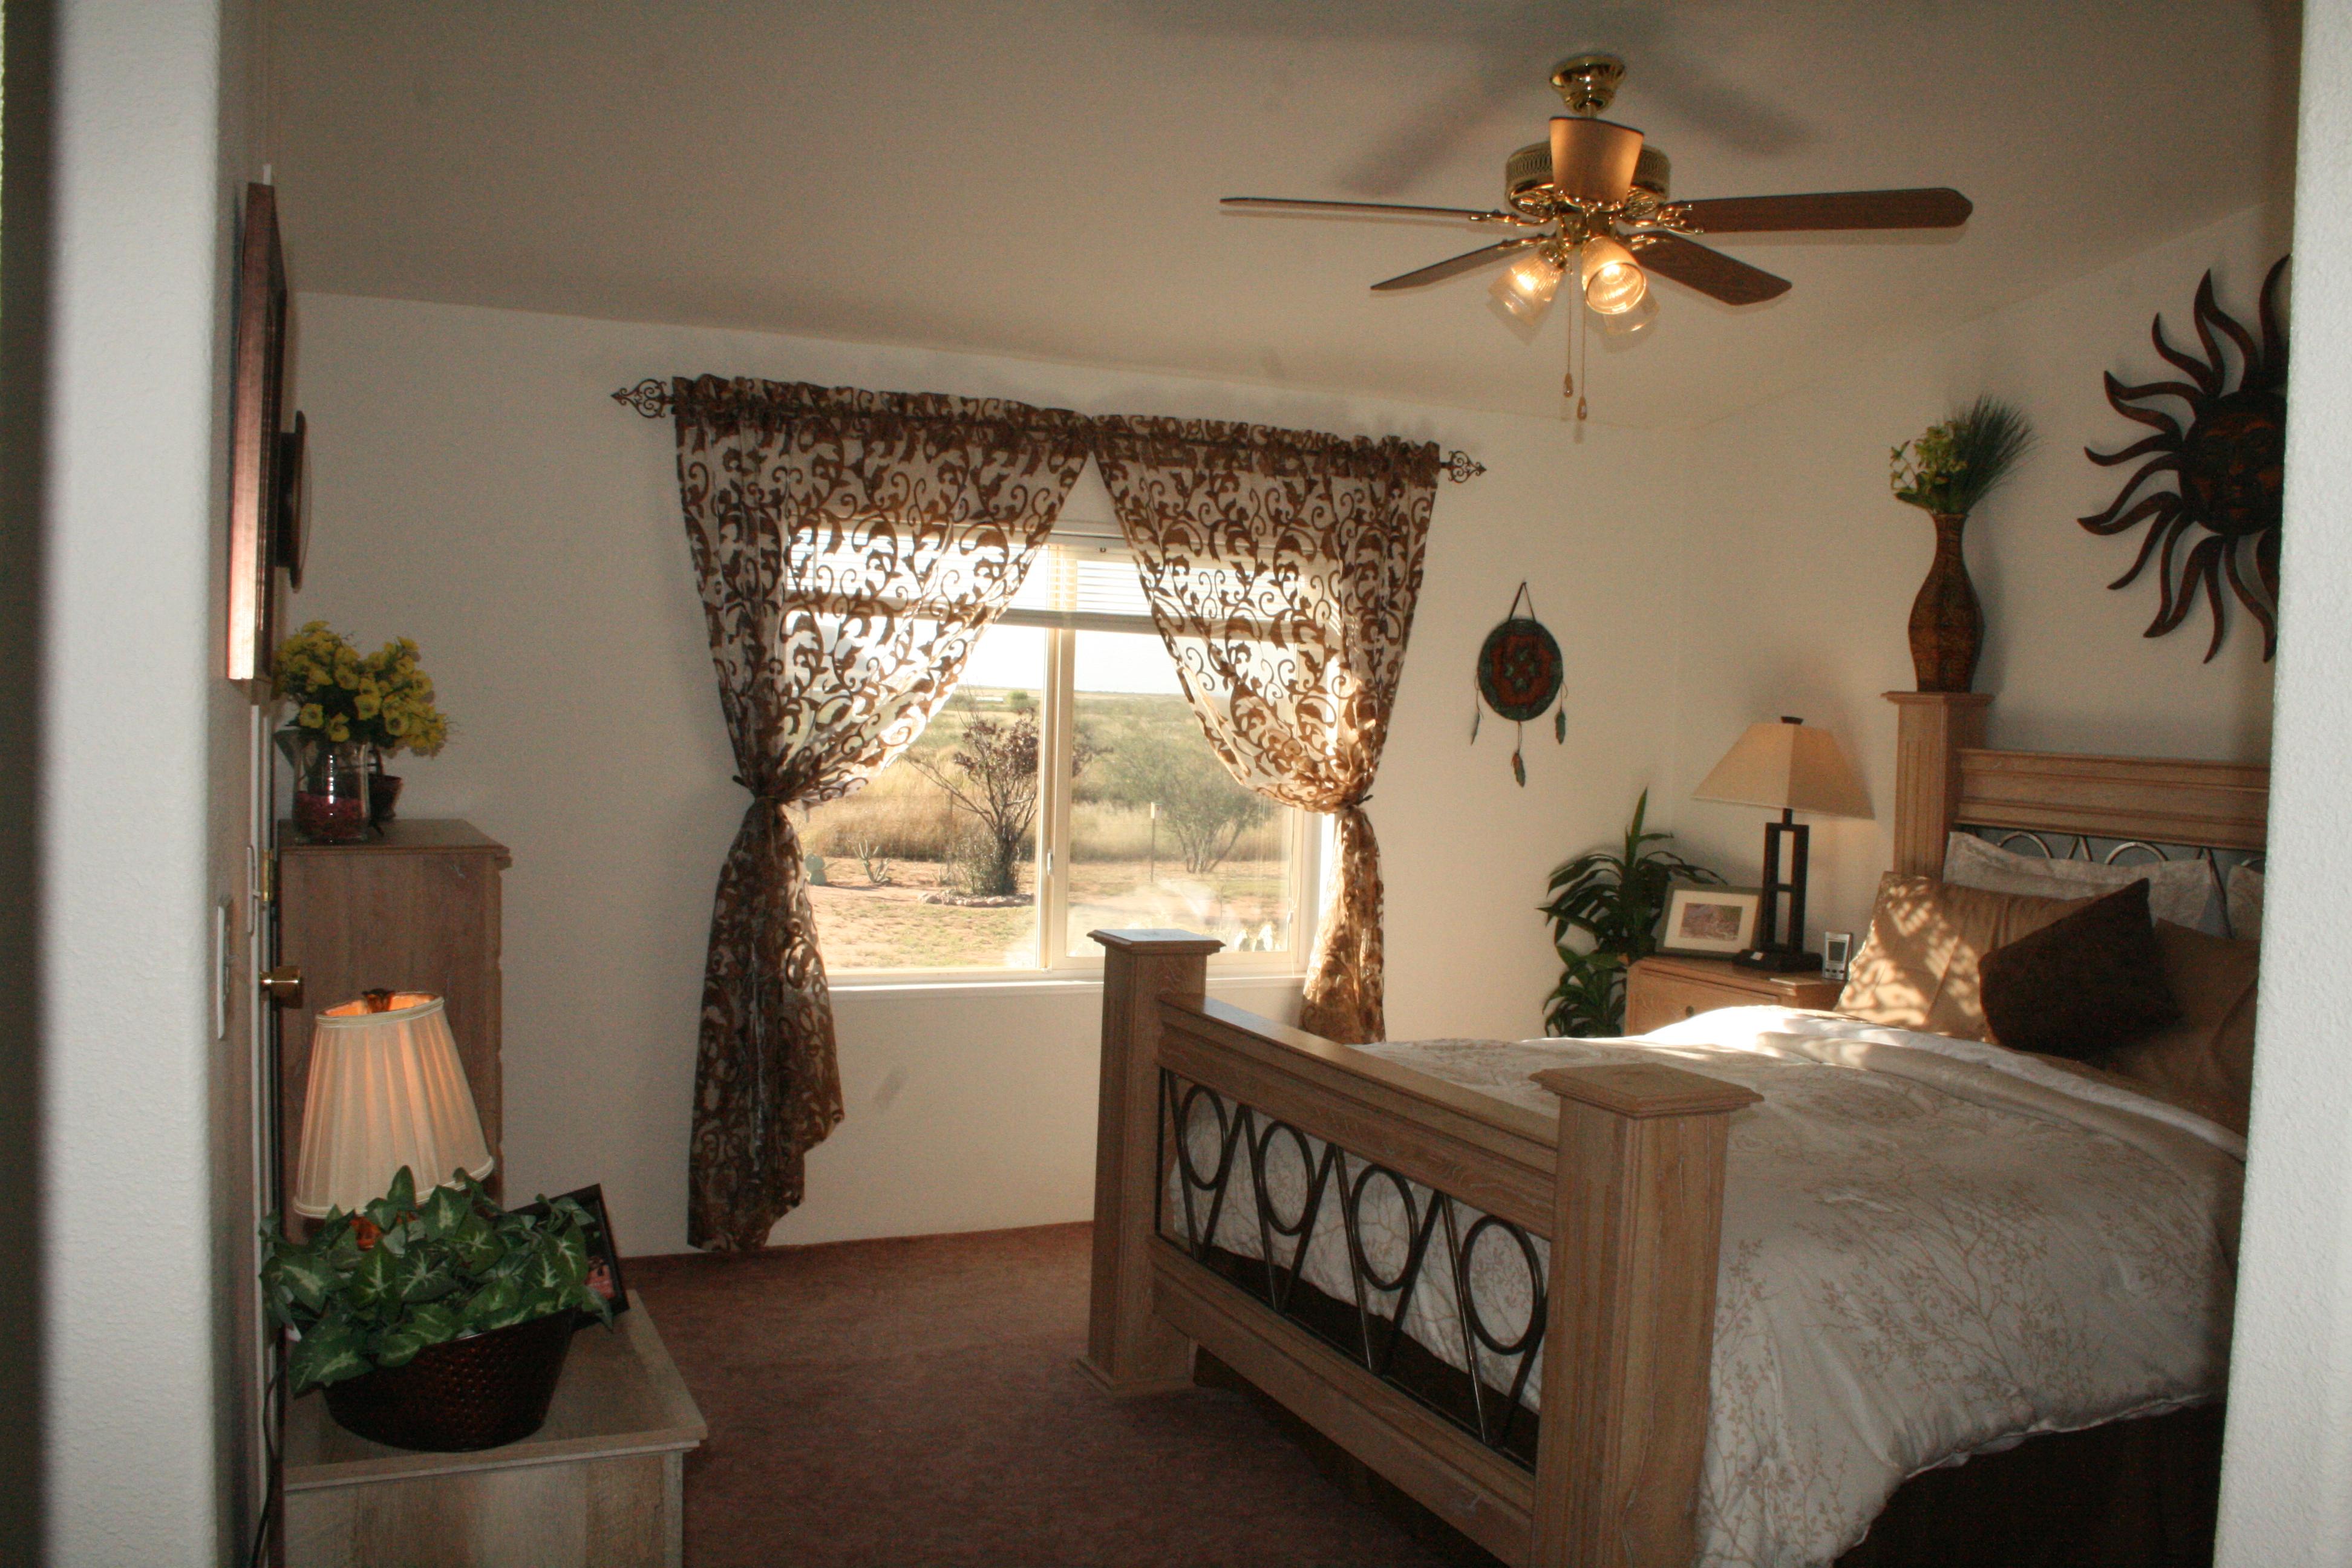 Hummingbird Ranch Vacation Rental in SE Arizona WI-FI*